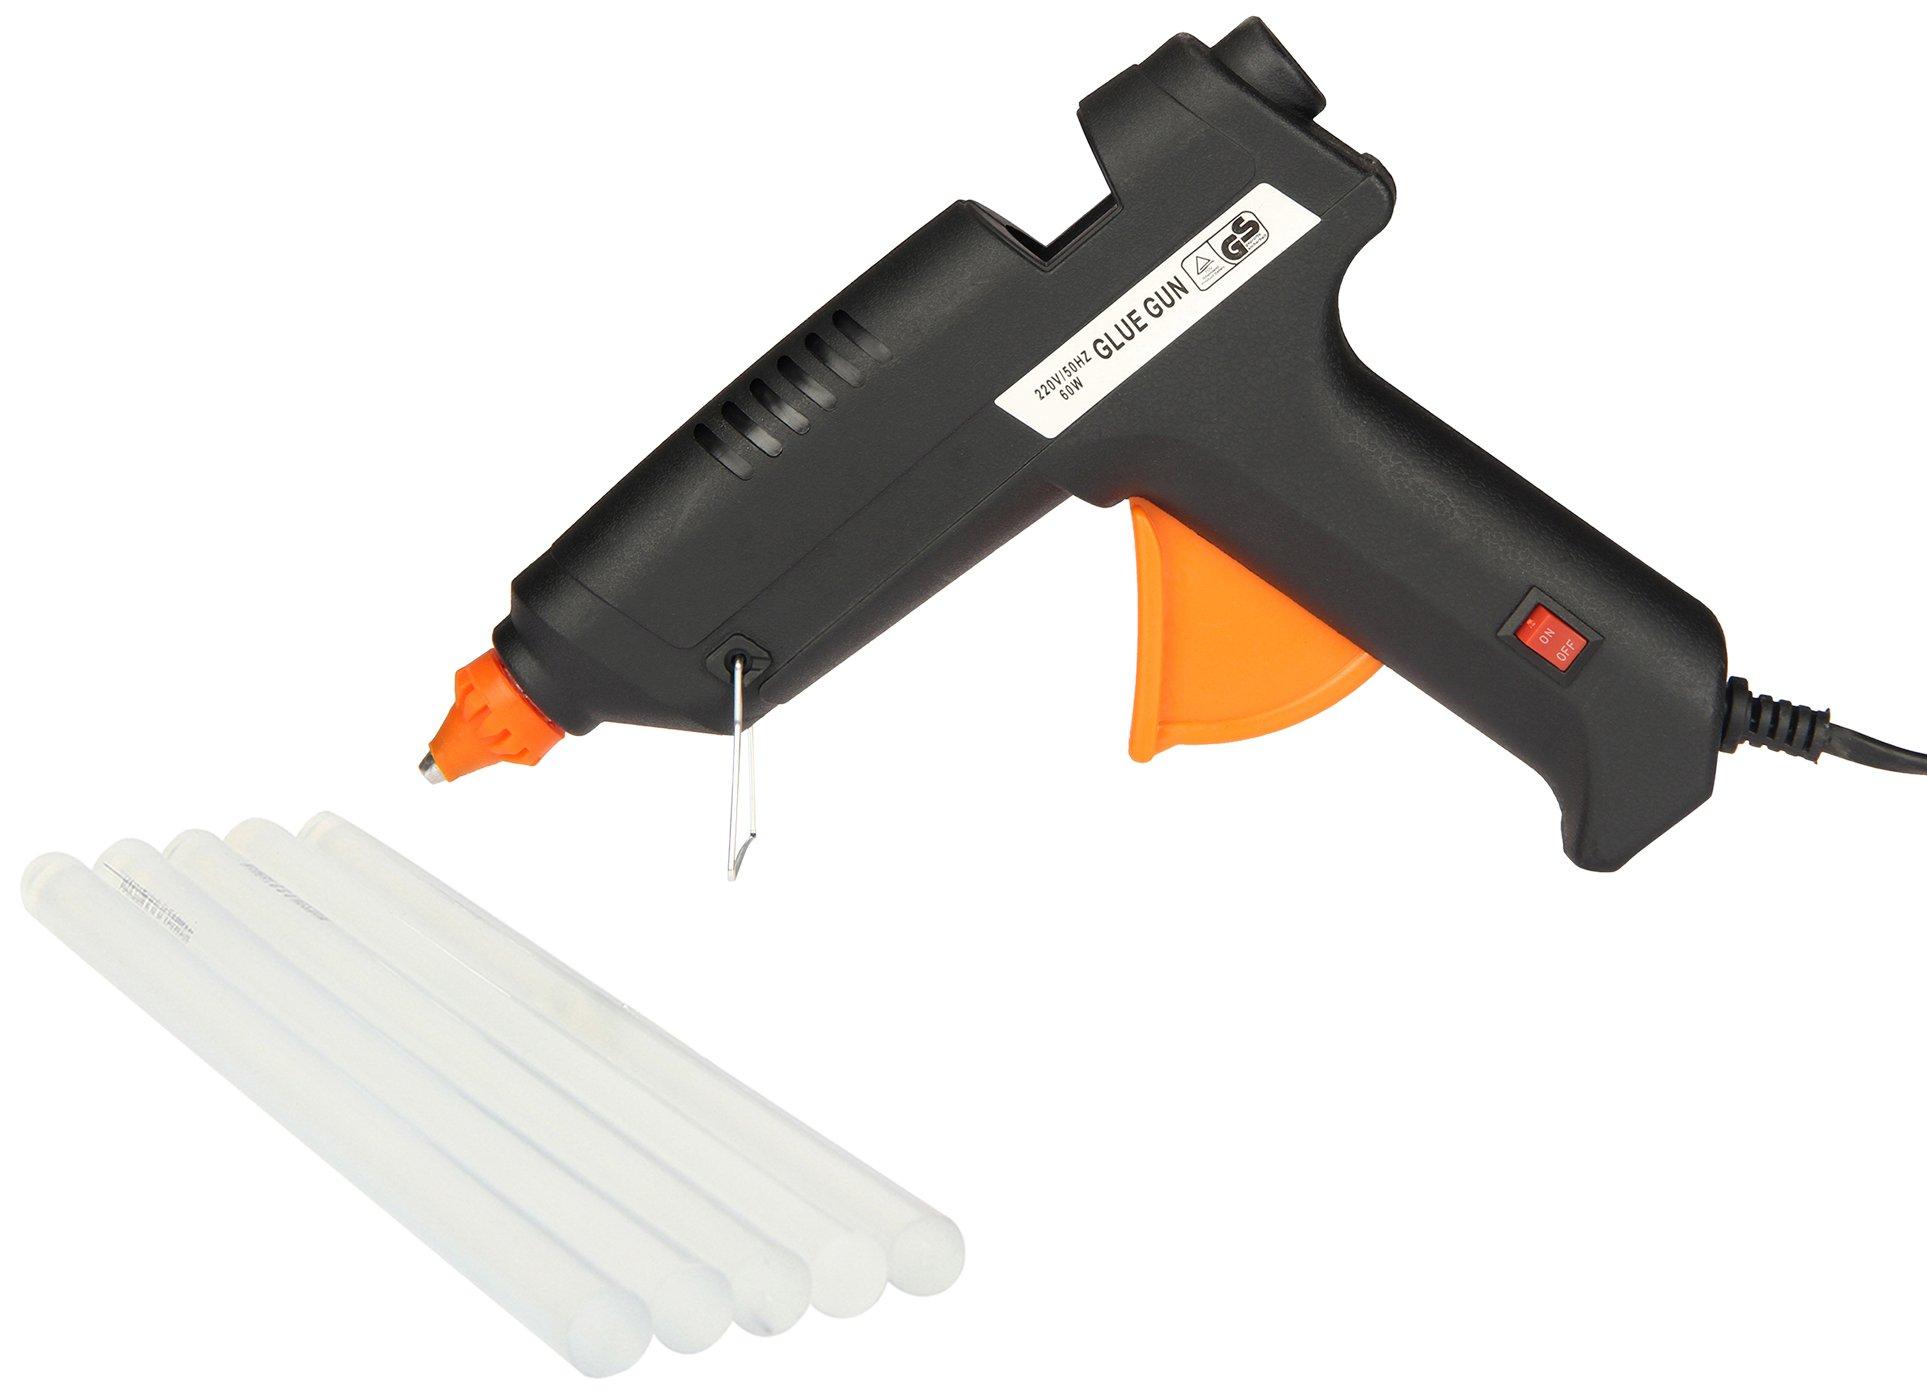 Spartan 60 Watt Glue Gun,Pro 60with 2 Pieces Spartan Glue Stick of 8 Inch Size (B072KKTMMG) Amazon Price History, Amazon Price Tracker